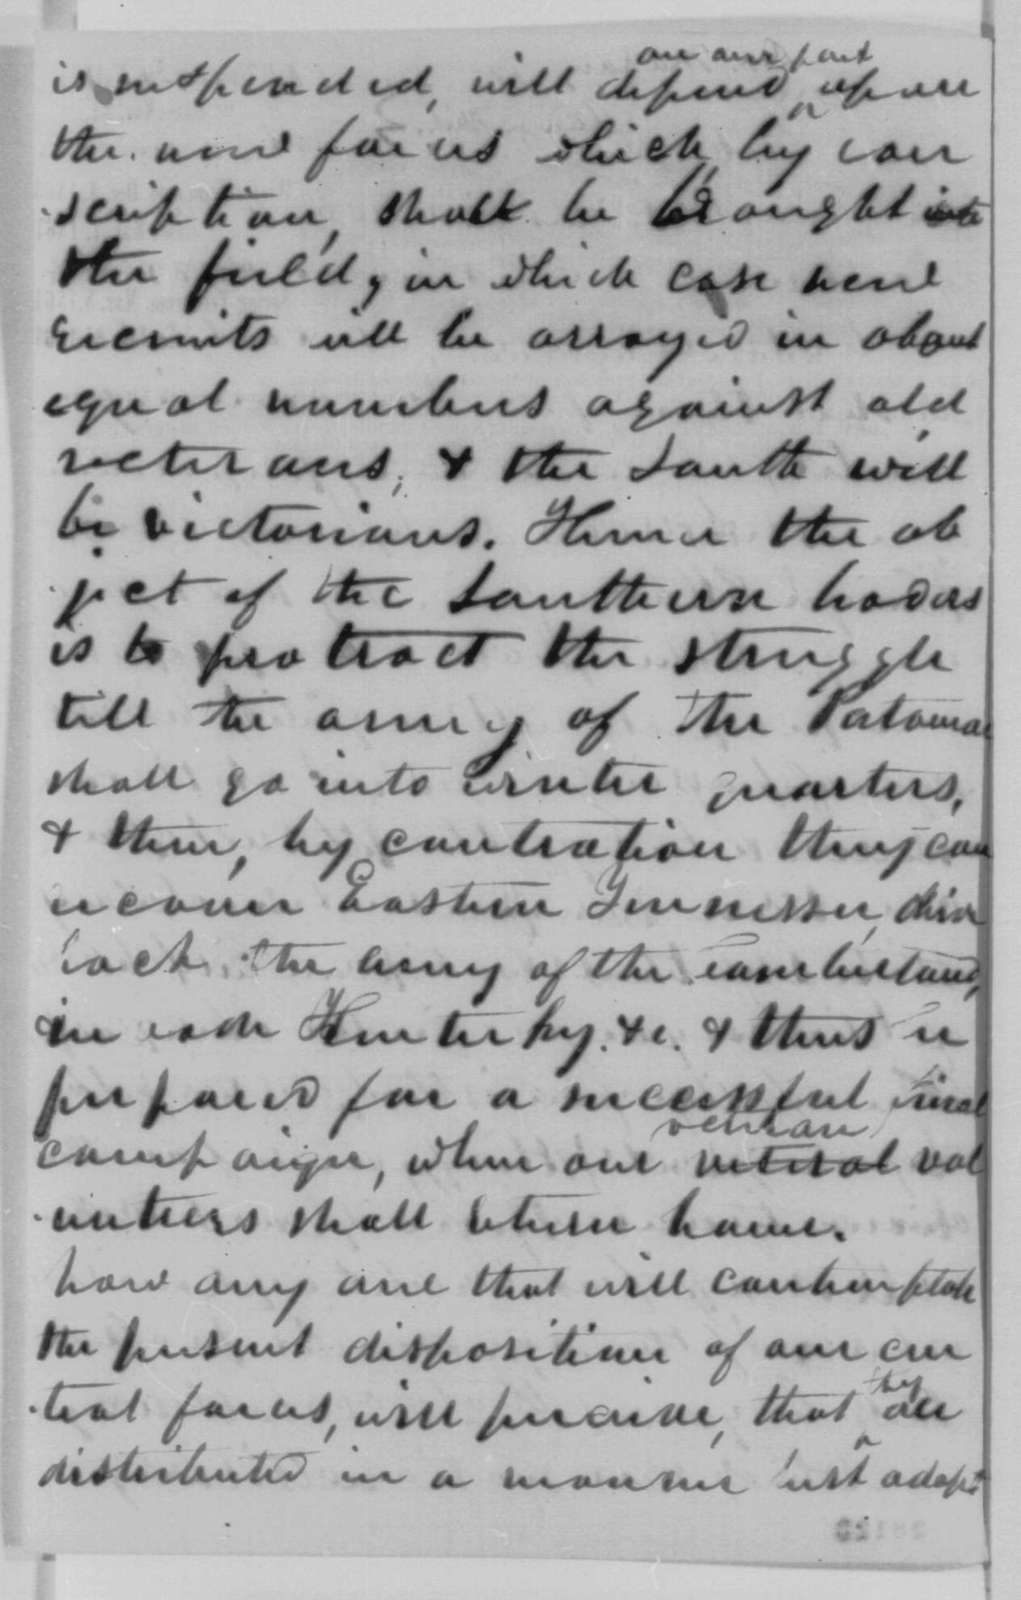 Asa Mahan to Salmon P. Chase, Thursday, November 19, 1863  (Military affairs)